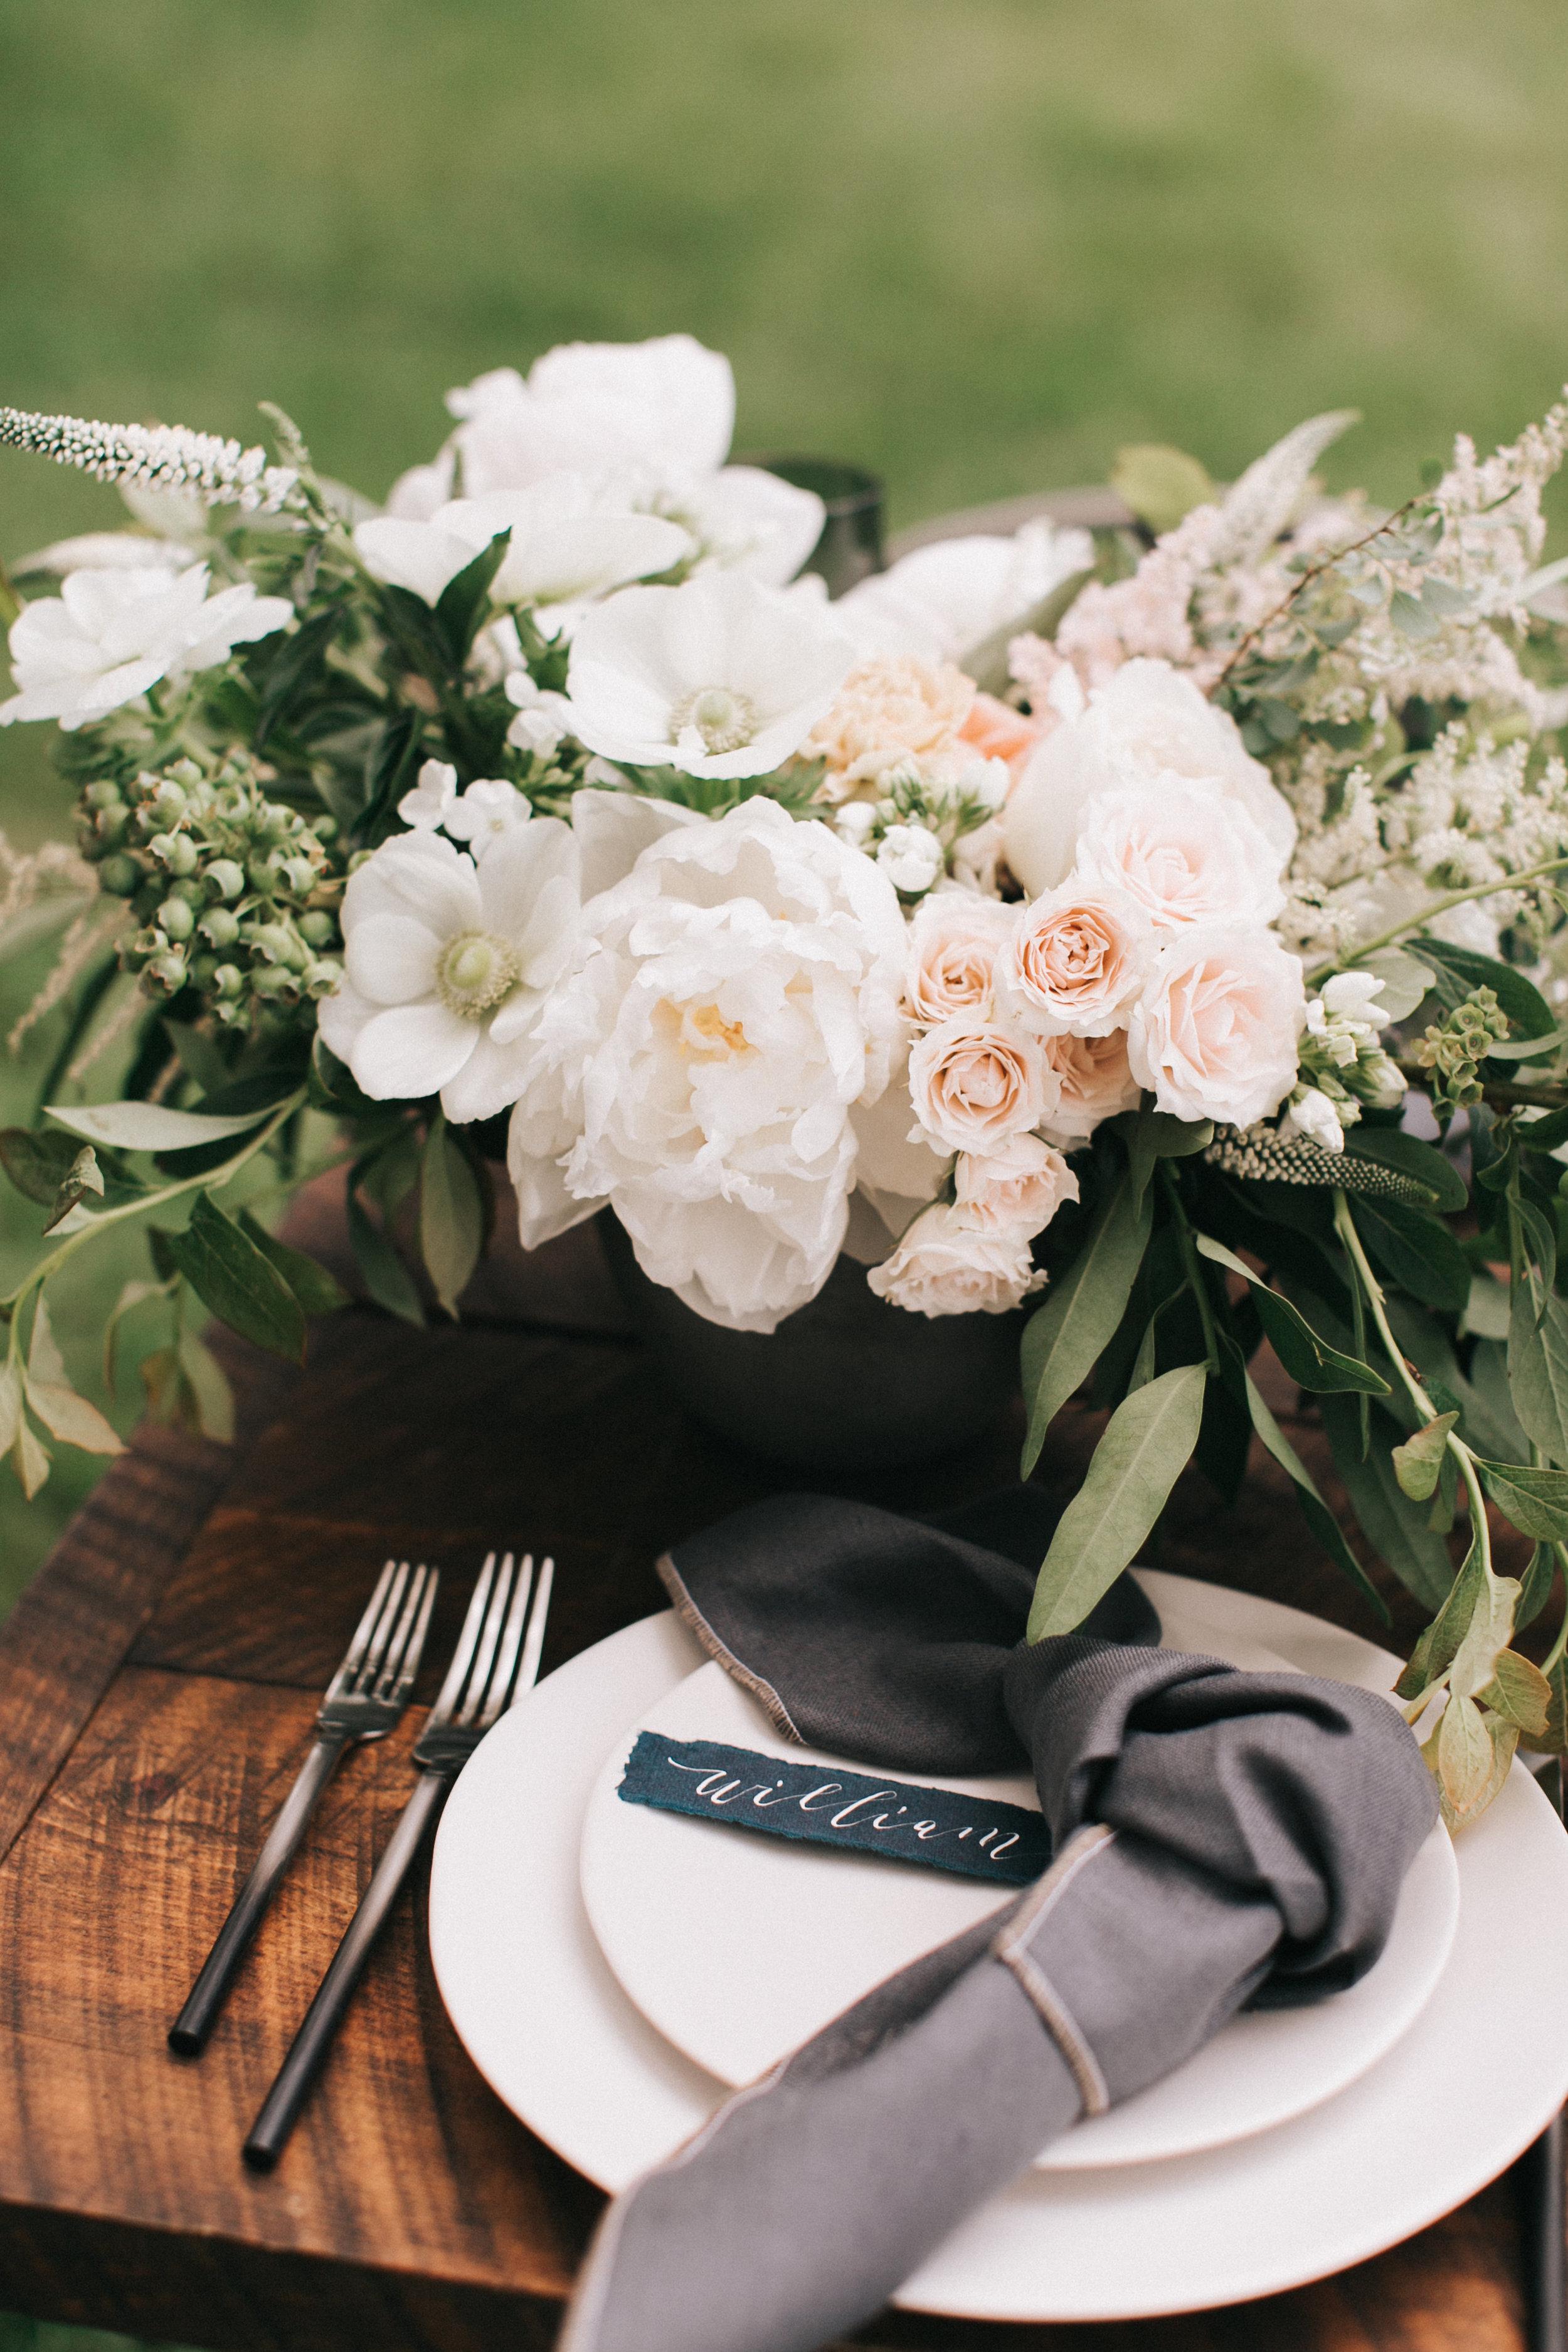 Watershed-Floral-Maine-Maritime-Wedding-Bridal-Bouquet-Centerpieces-0039.jpg